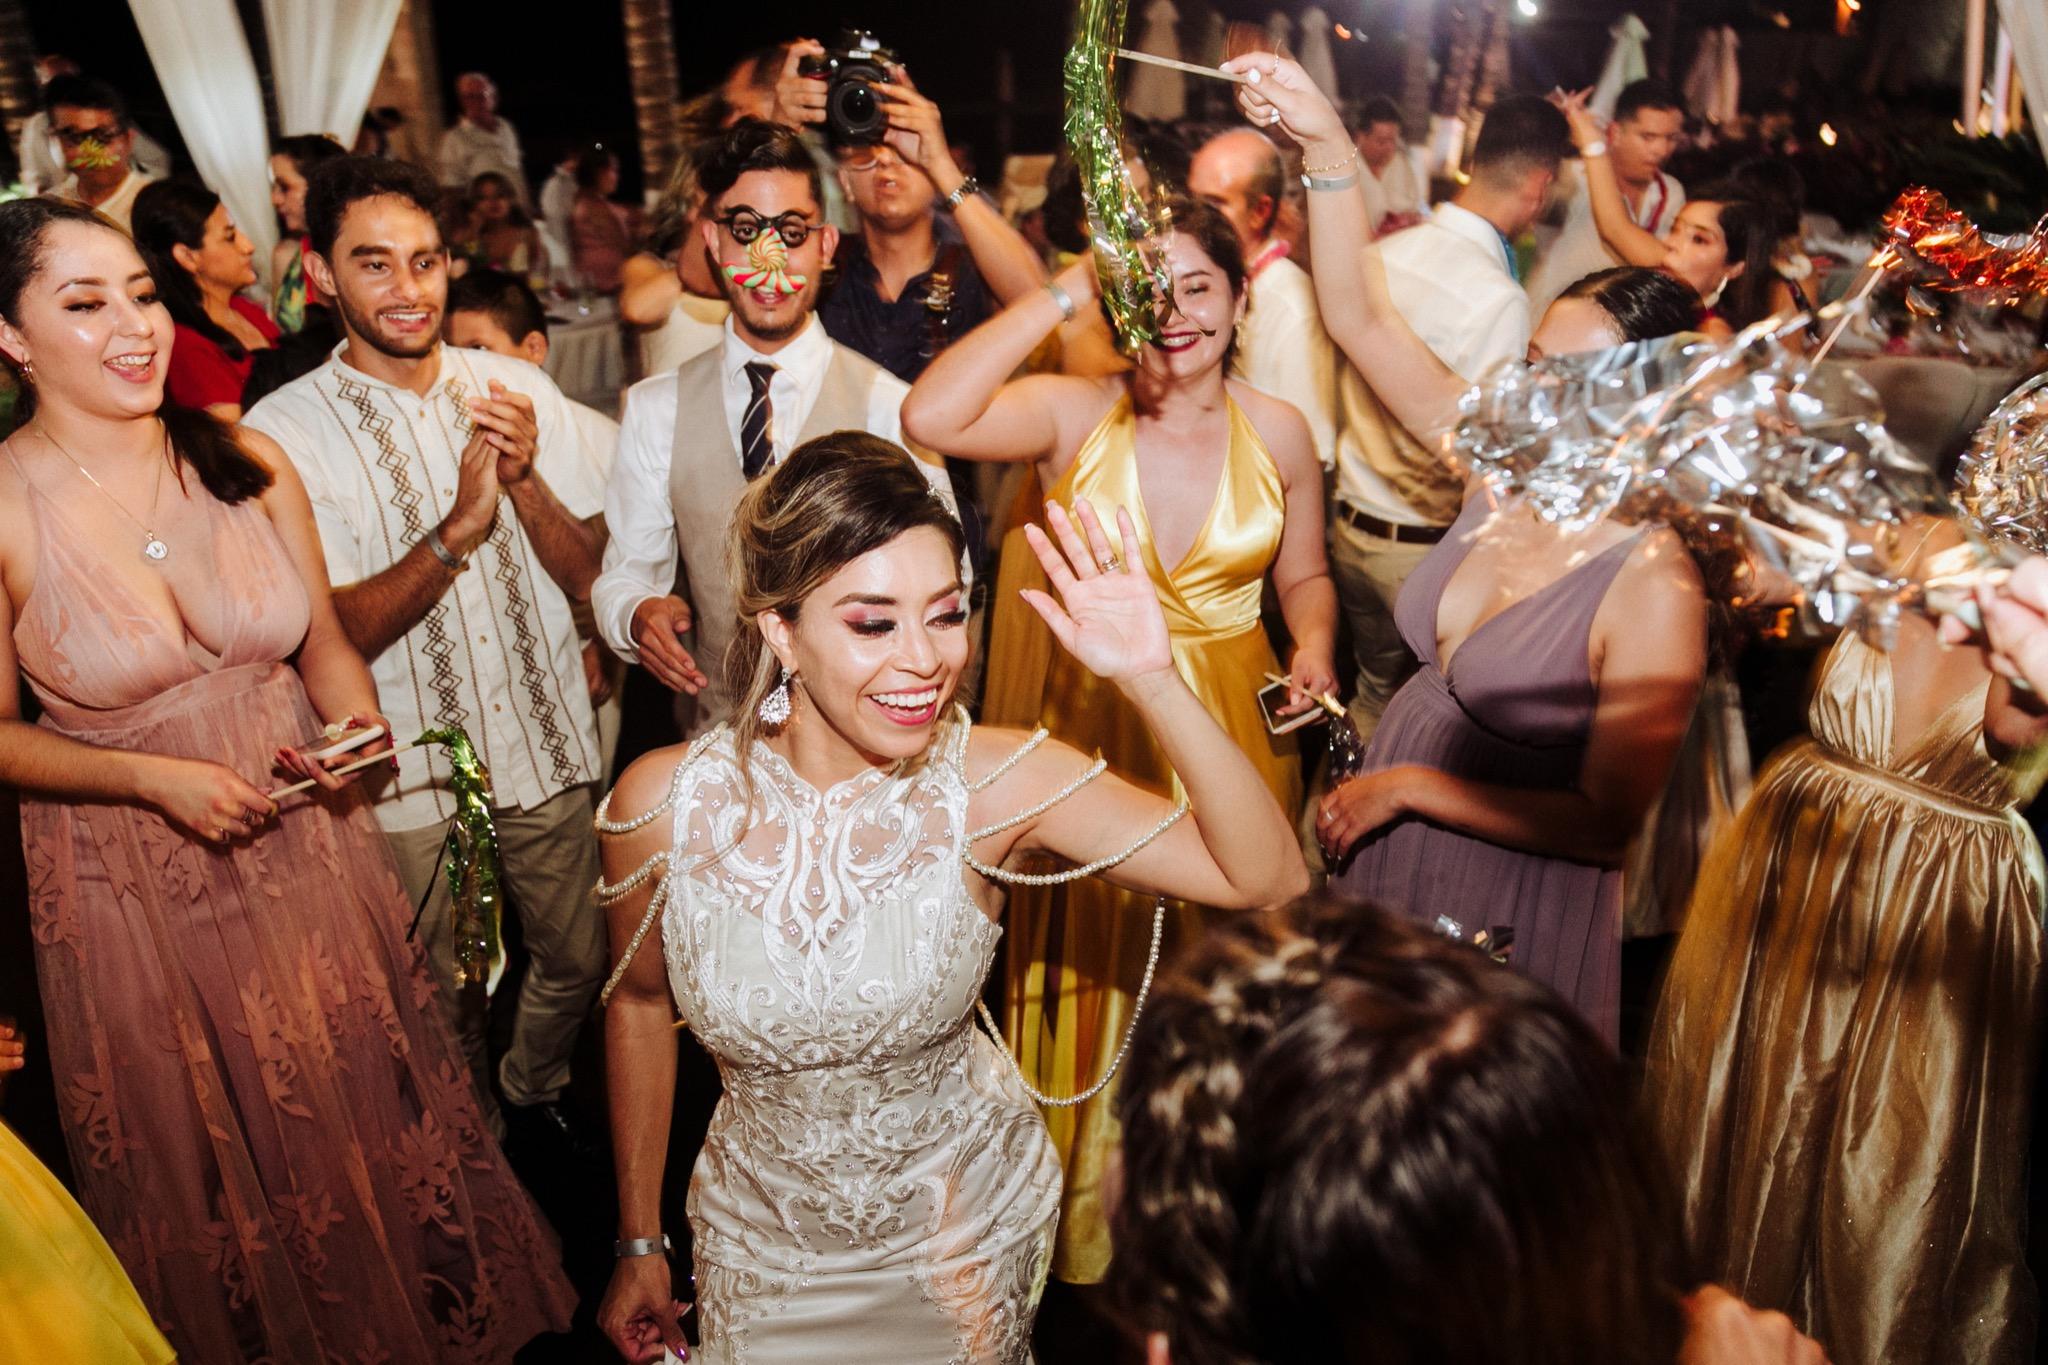 Javier_noriega_fotografo_bodas_profesional_zacatecas_mexico_mazatlan_sinaloa_photographer_weddings82